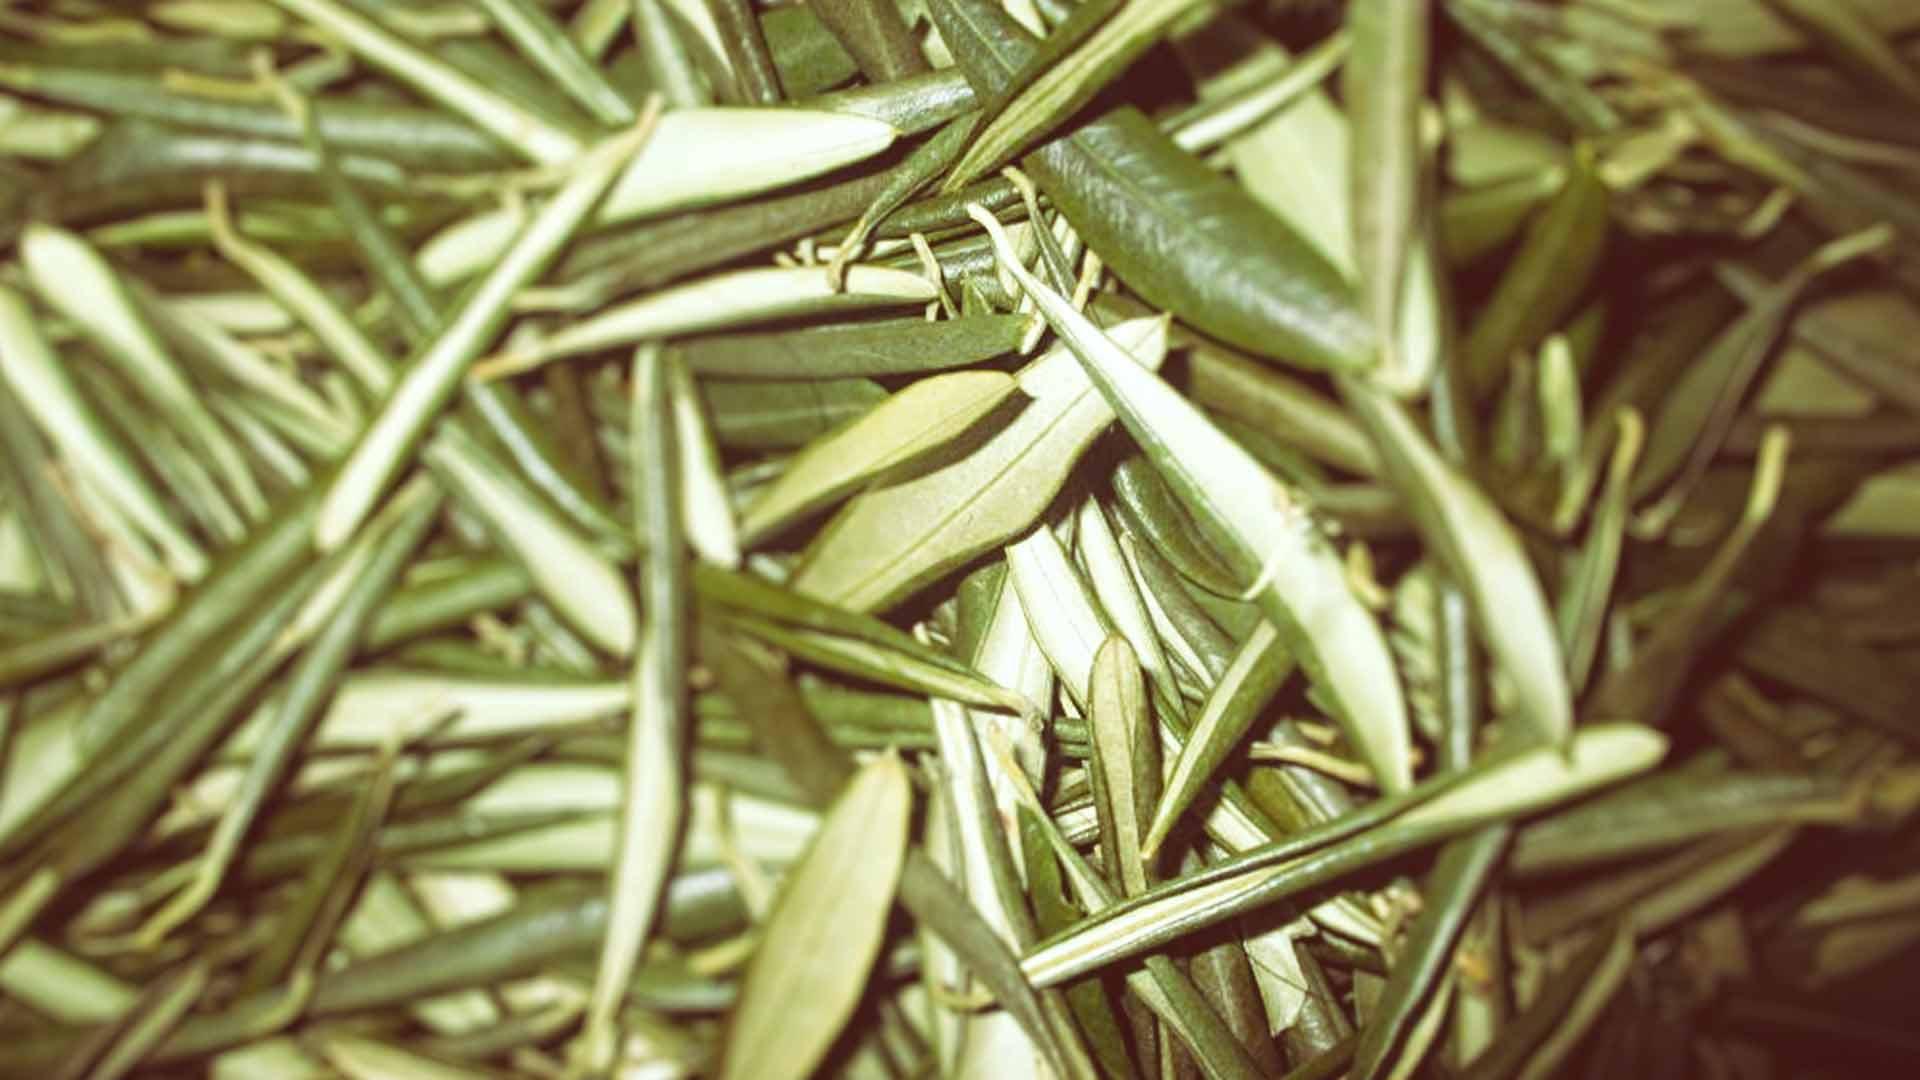 Ancestorsearth Olive Leaves